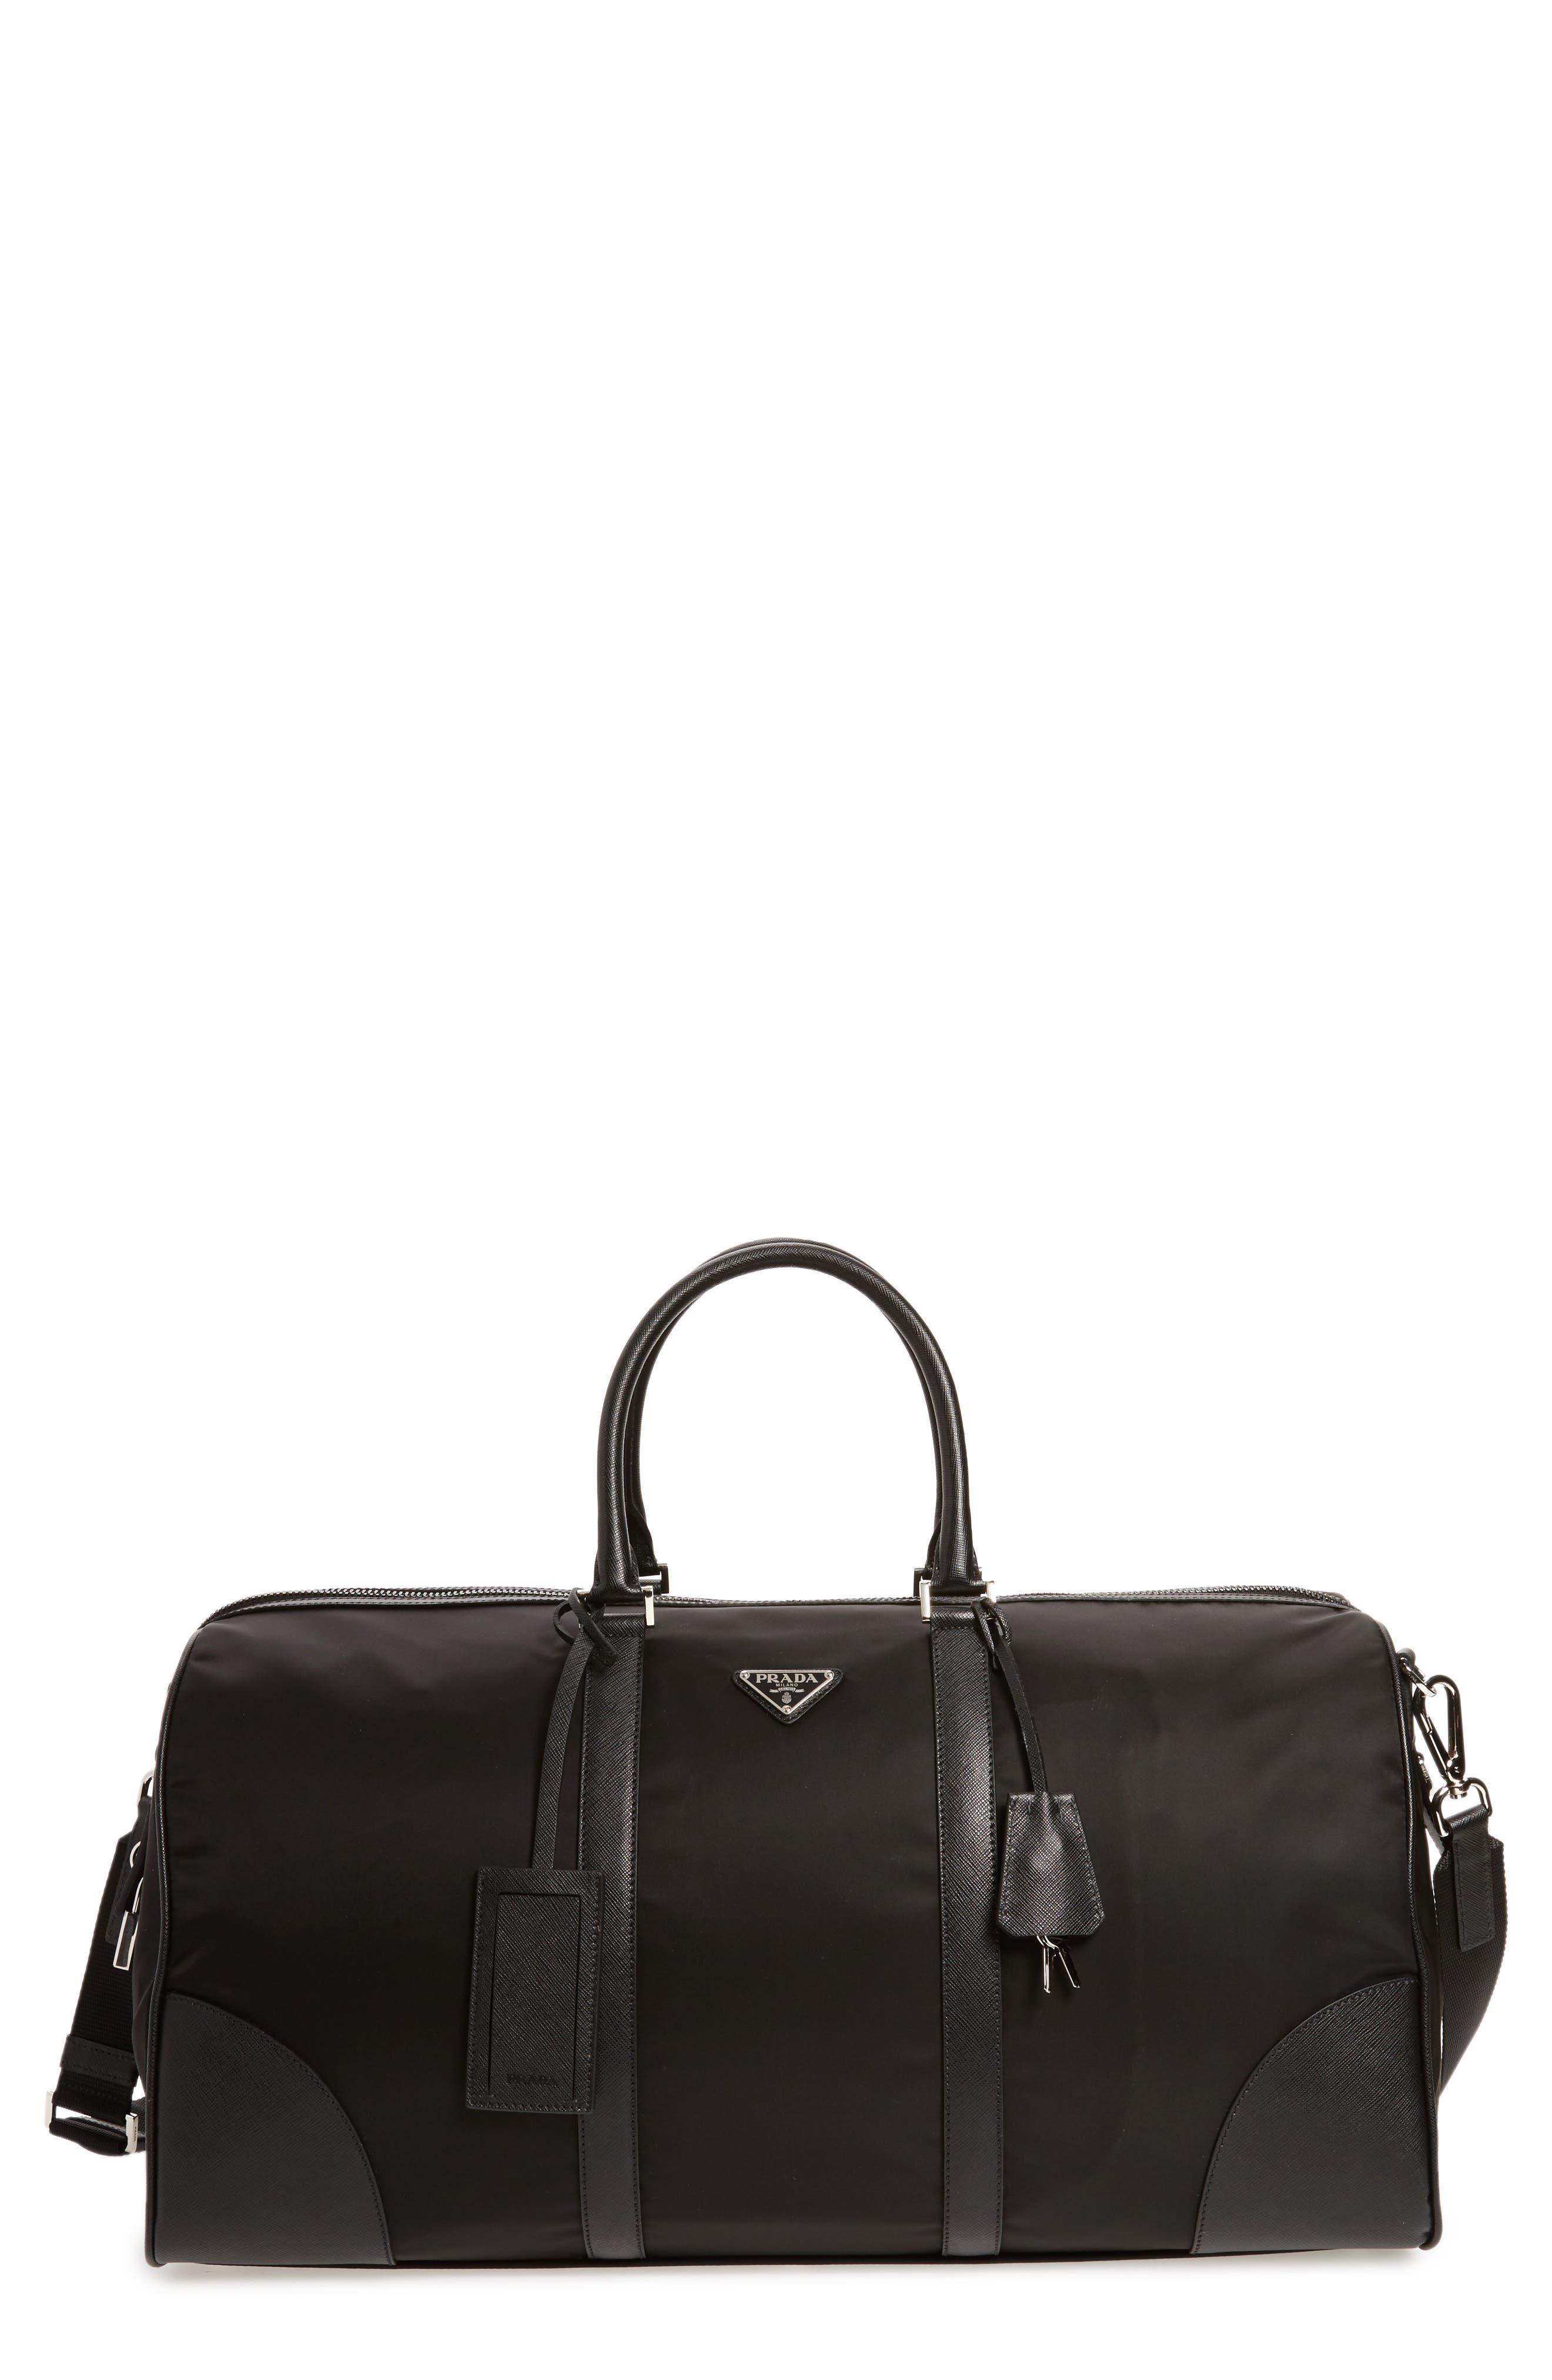 Main Image - Prada Nylon & Saffiano Leather Bowling Bag